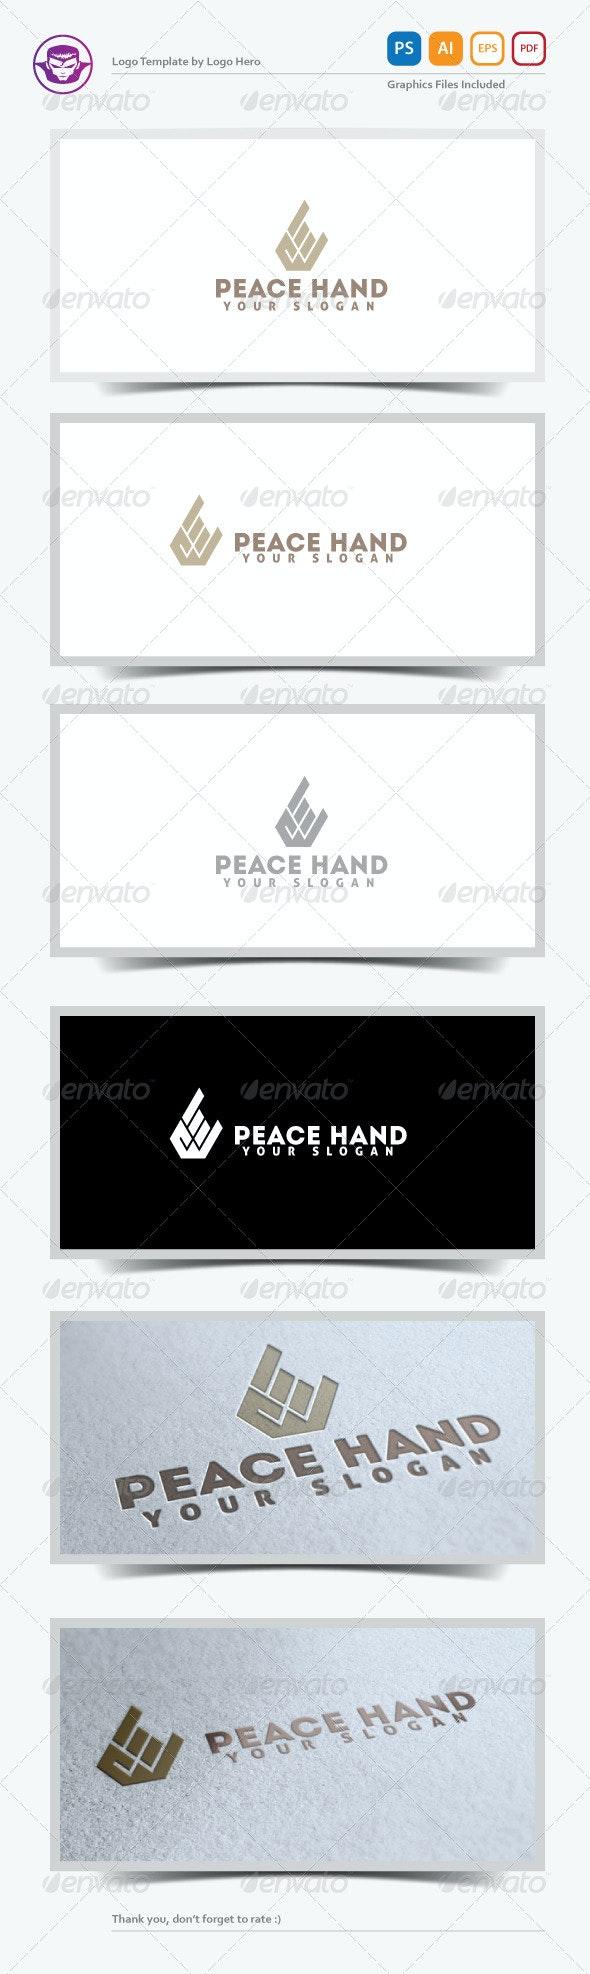 Peace Hand Logo Template